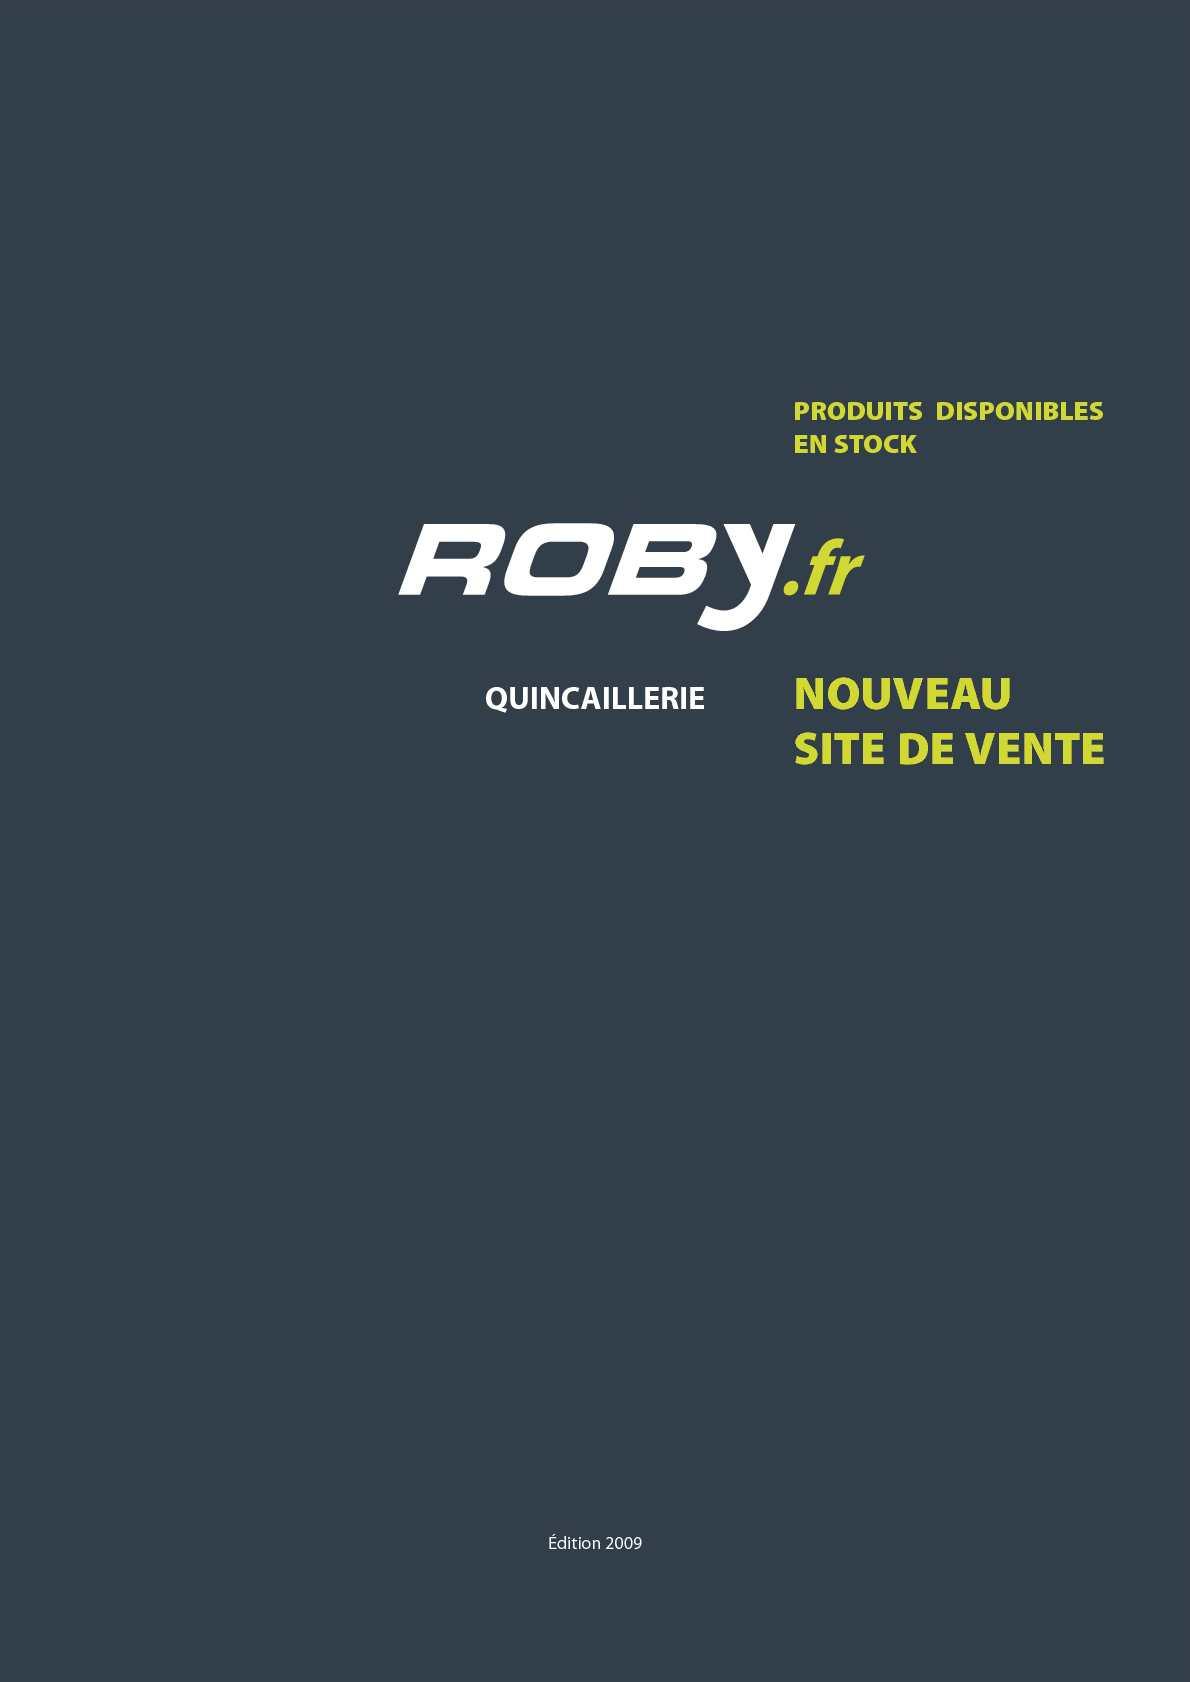 0a82775ced9f Calaméo - Roby, catalogue de fournitures en gros pour la quincaillerie,  mars 2010